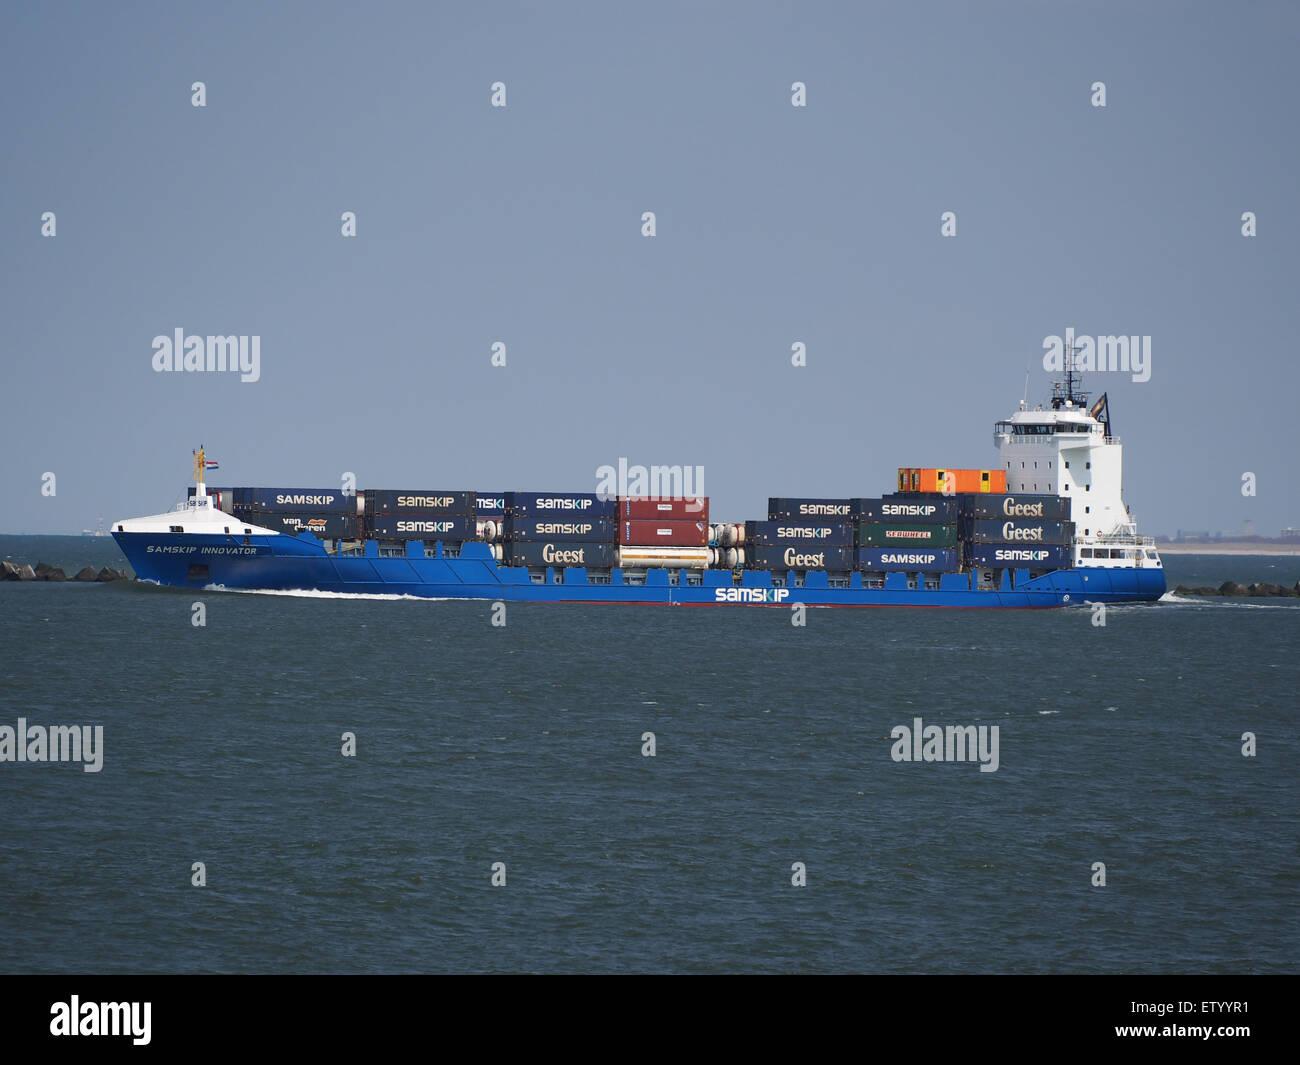 Samskip Innovator - IMO 9436214, Hafen von Rotterdam Stockbild